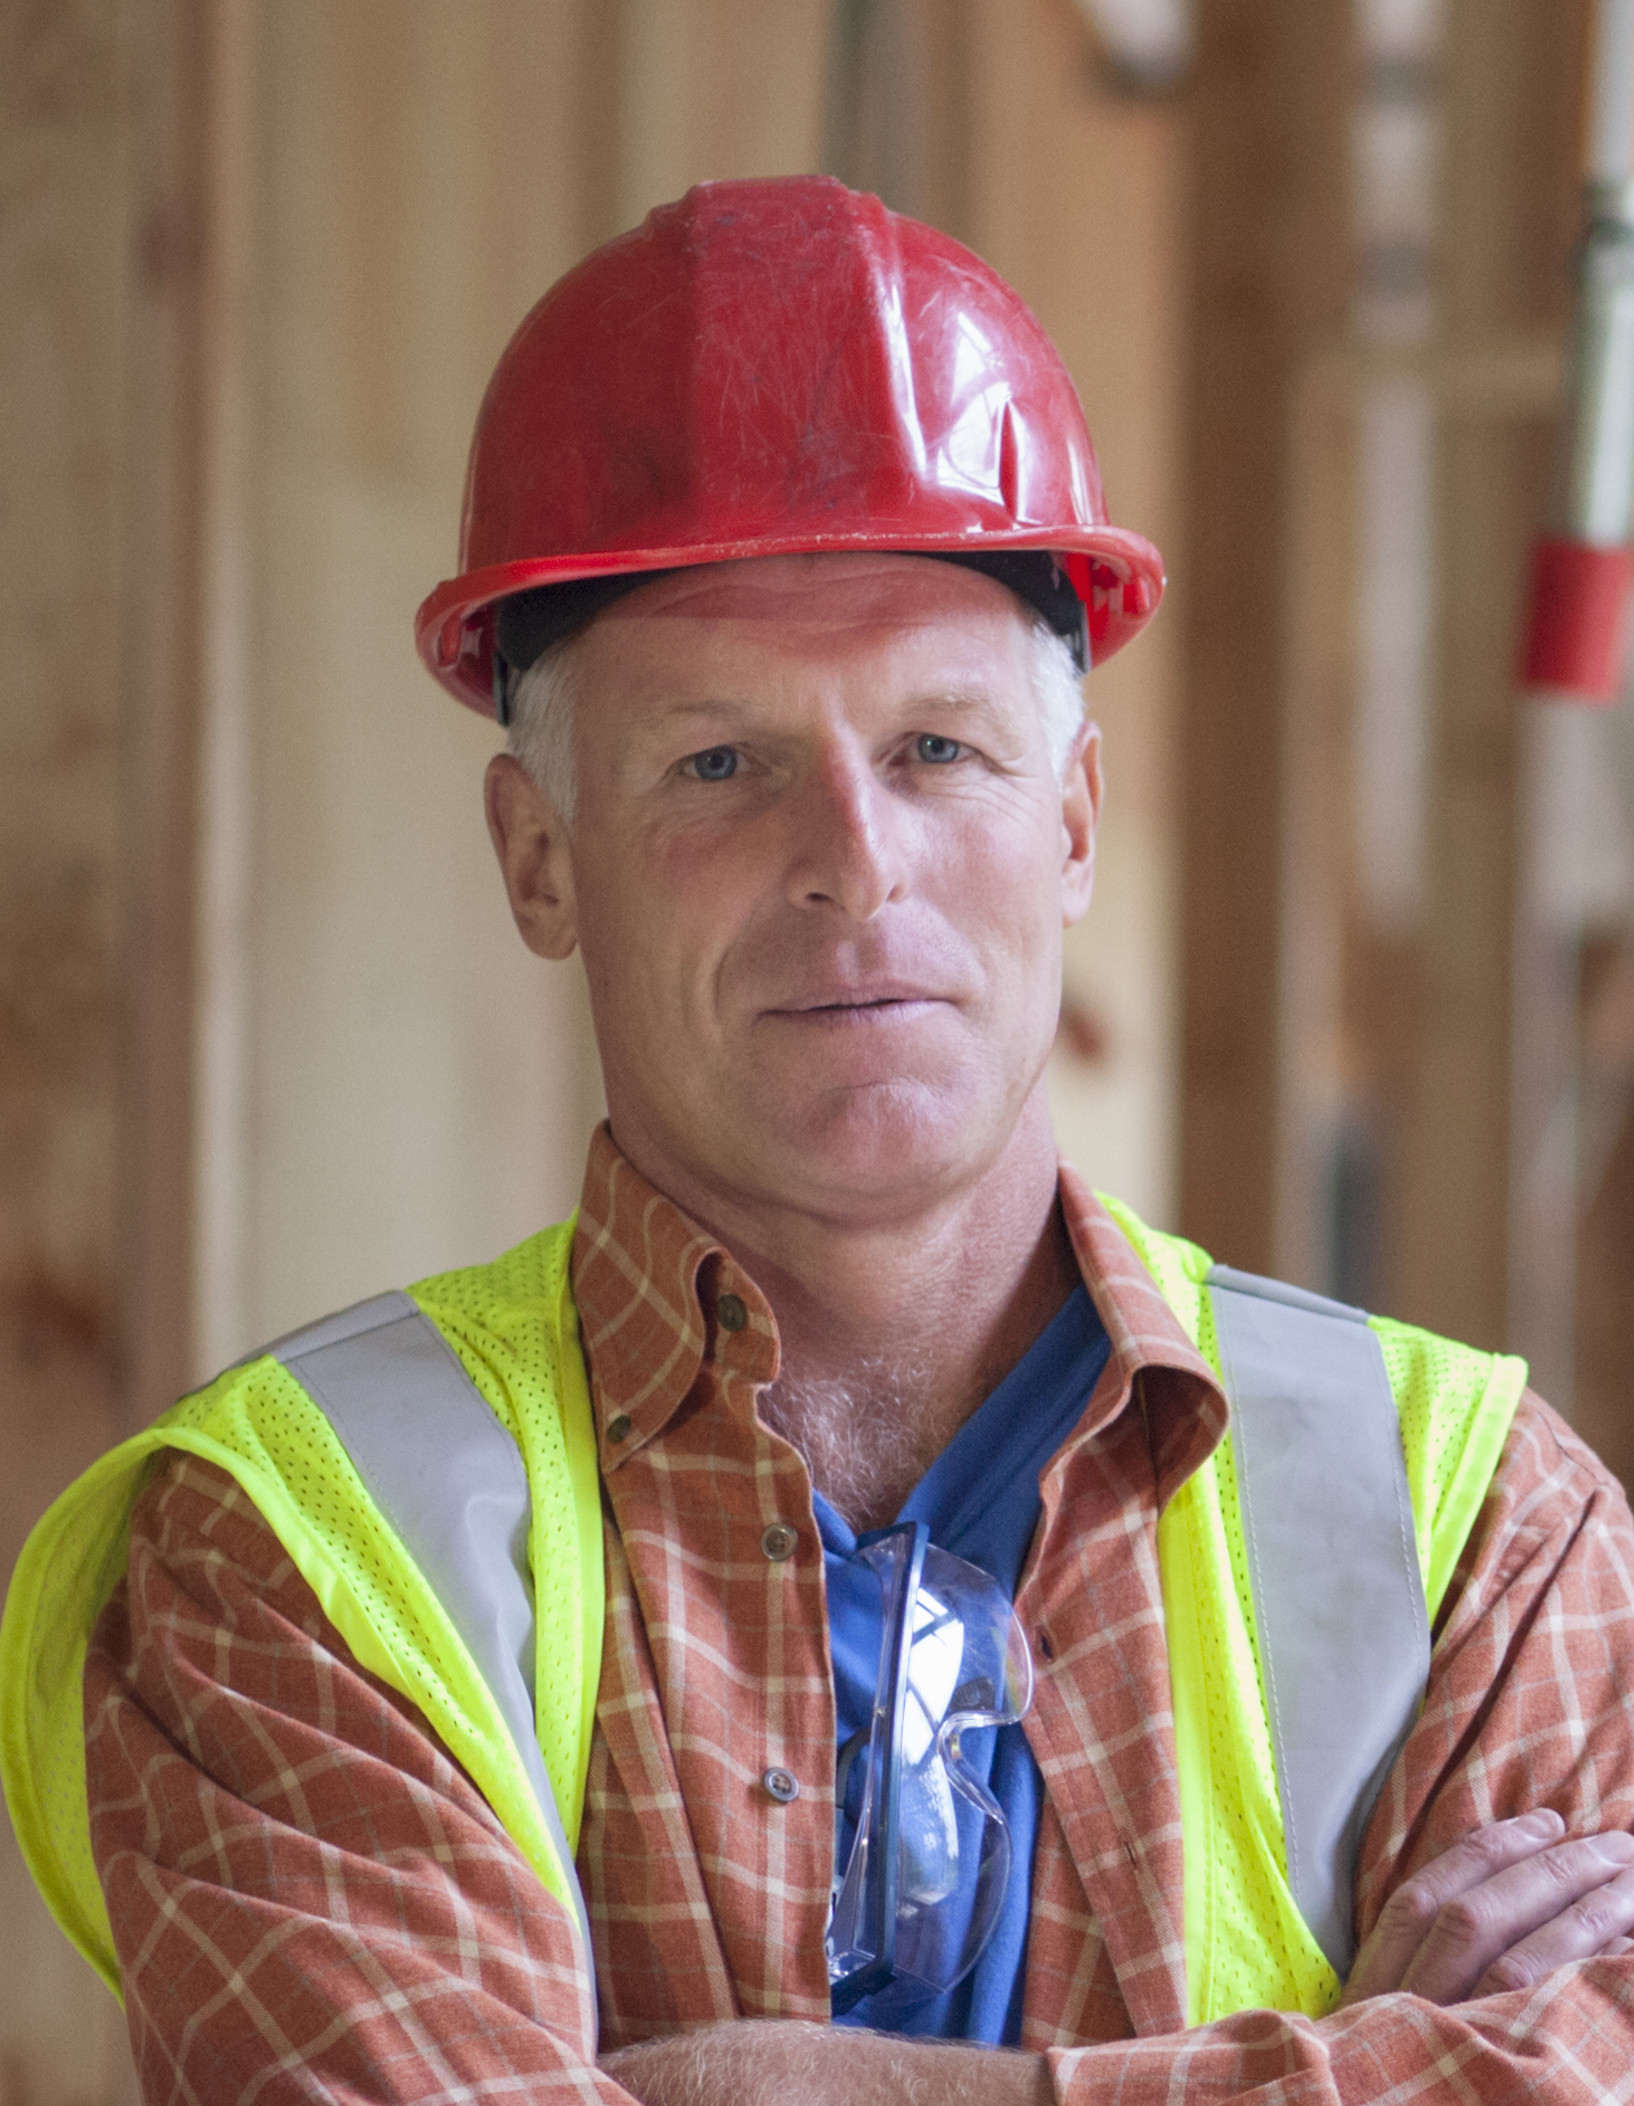 Asbestos Clearance Inspection/AirSampling